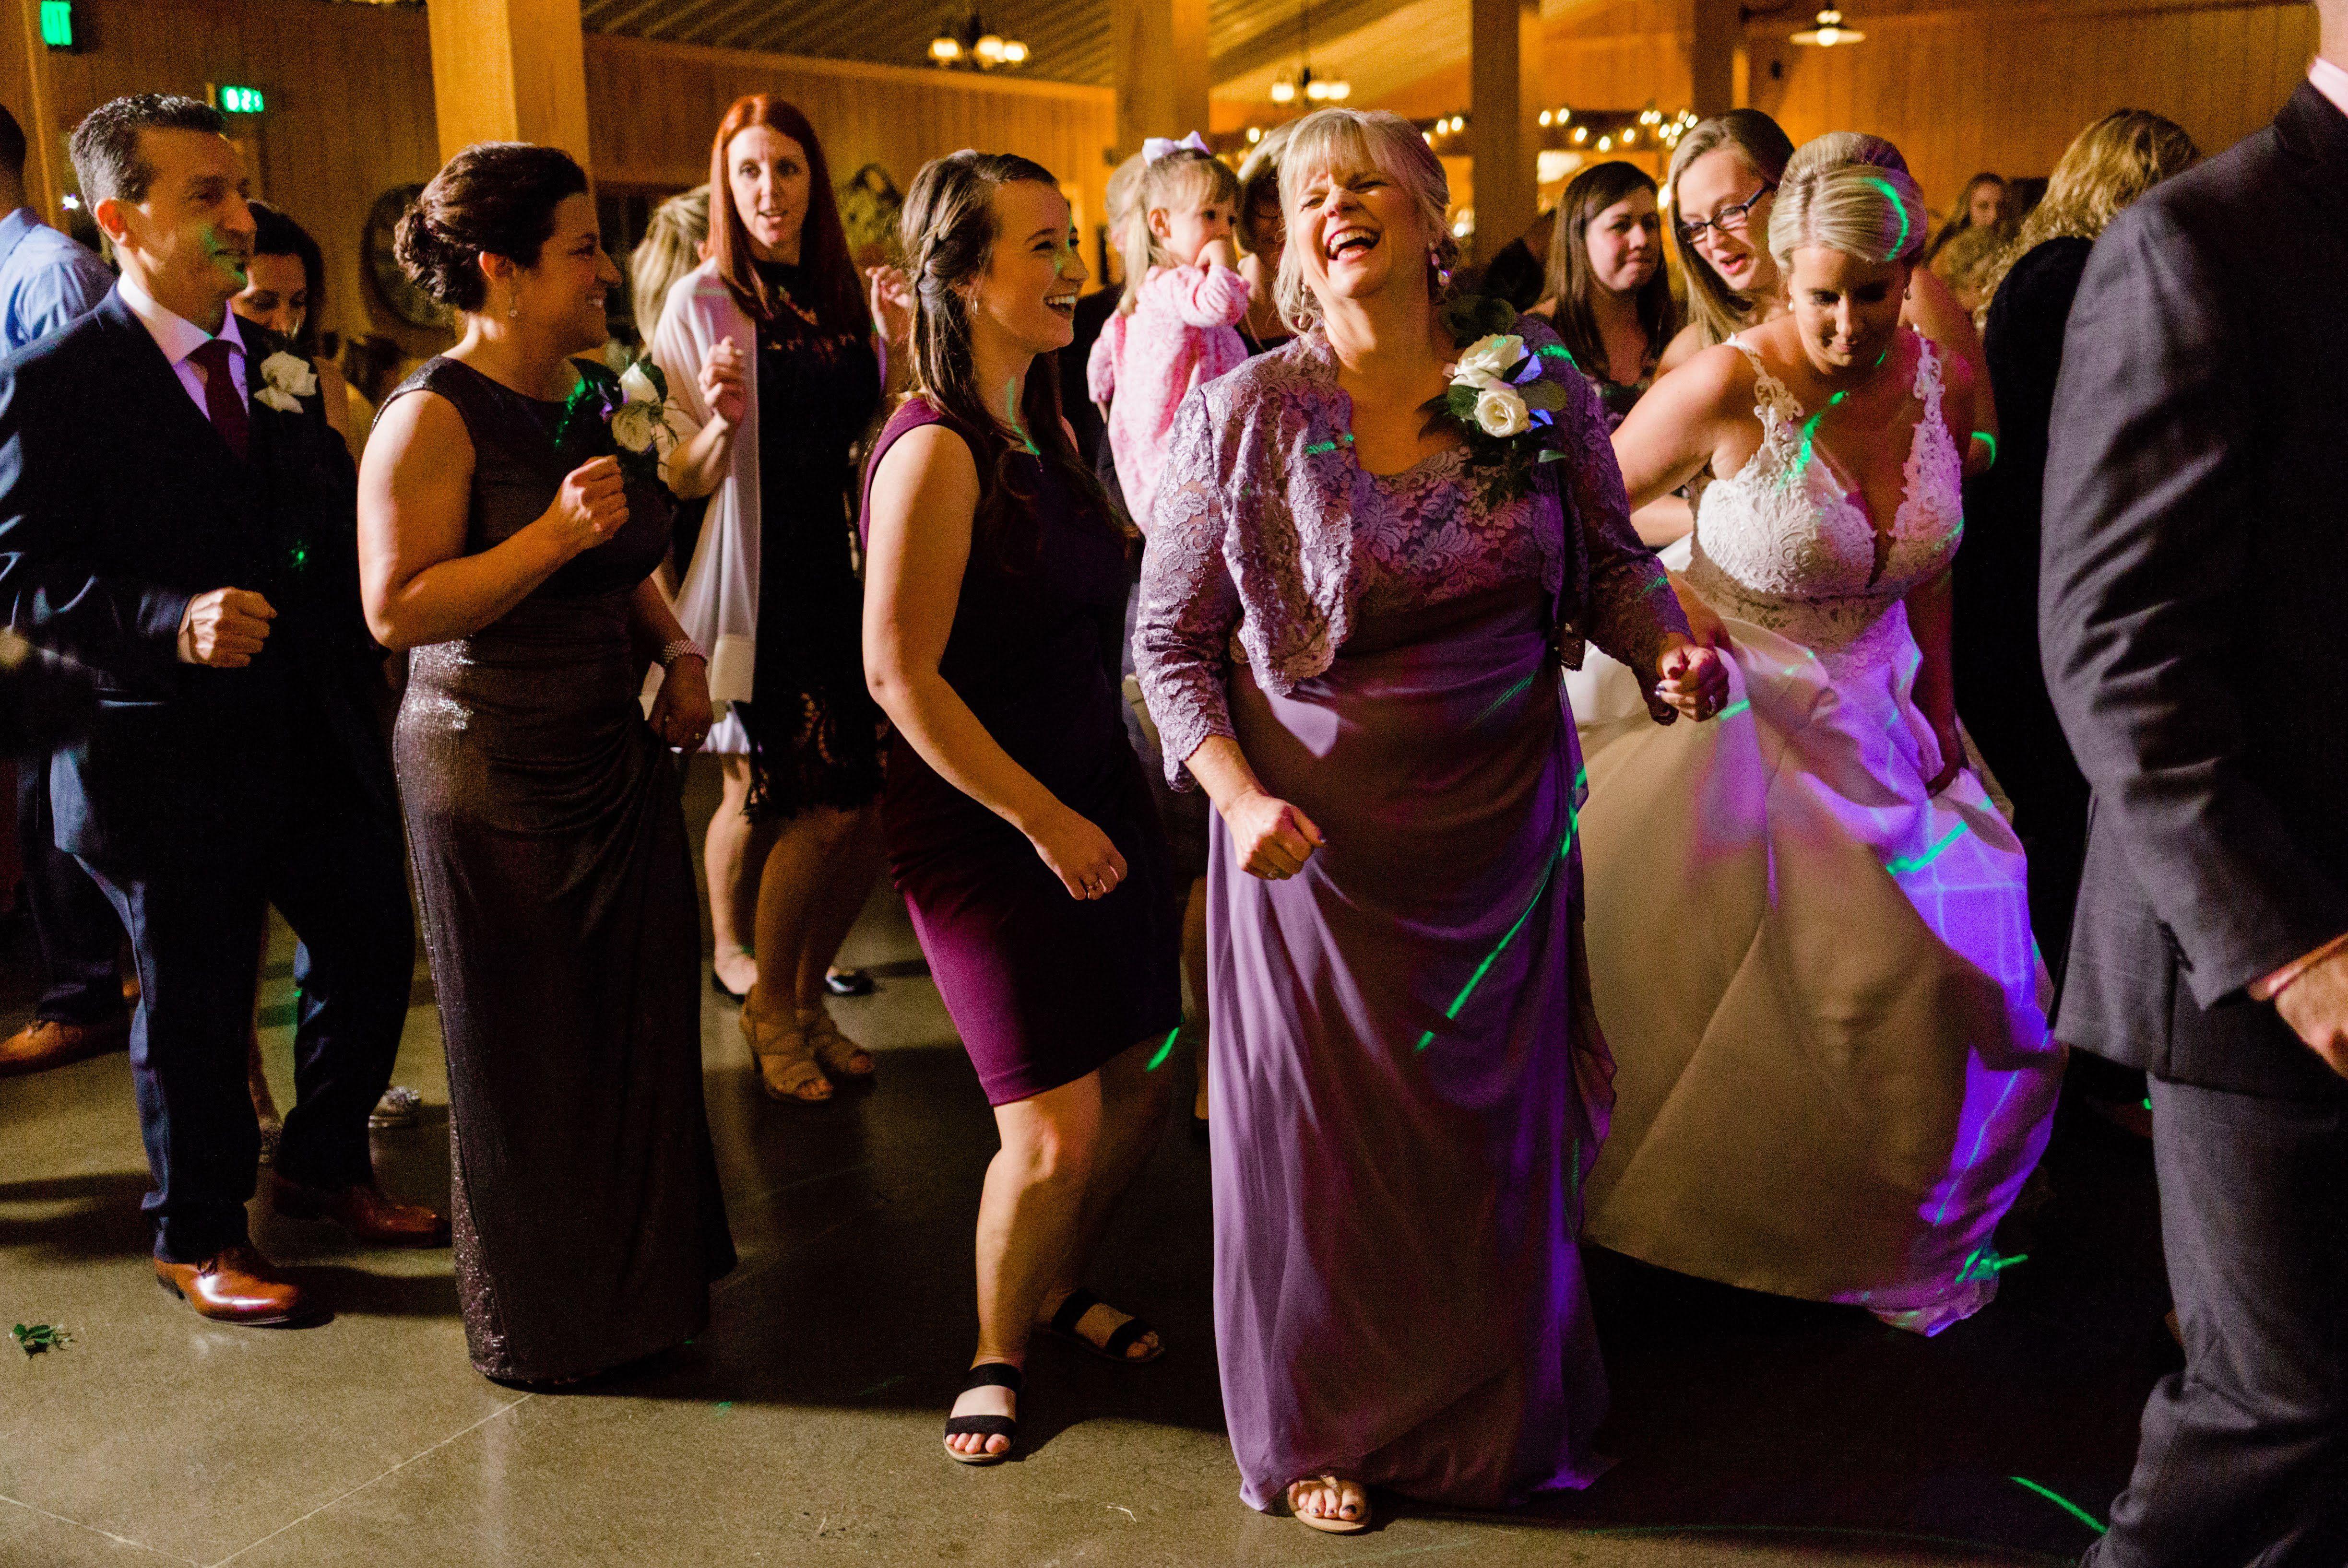 How To Hire A Top Notch Wedding Dj Wedding Dj Wedding Entertainment Wedding Reception Activities